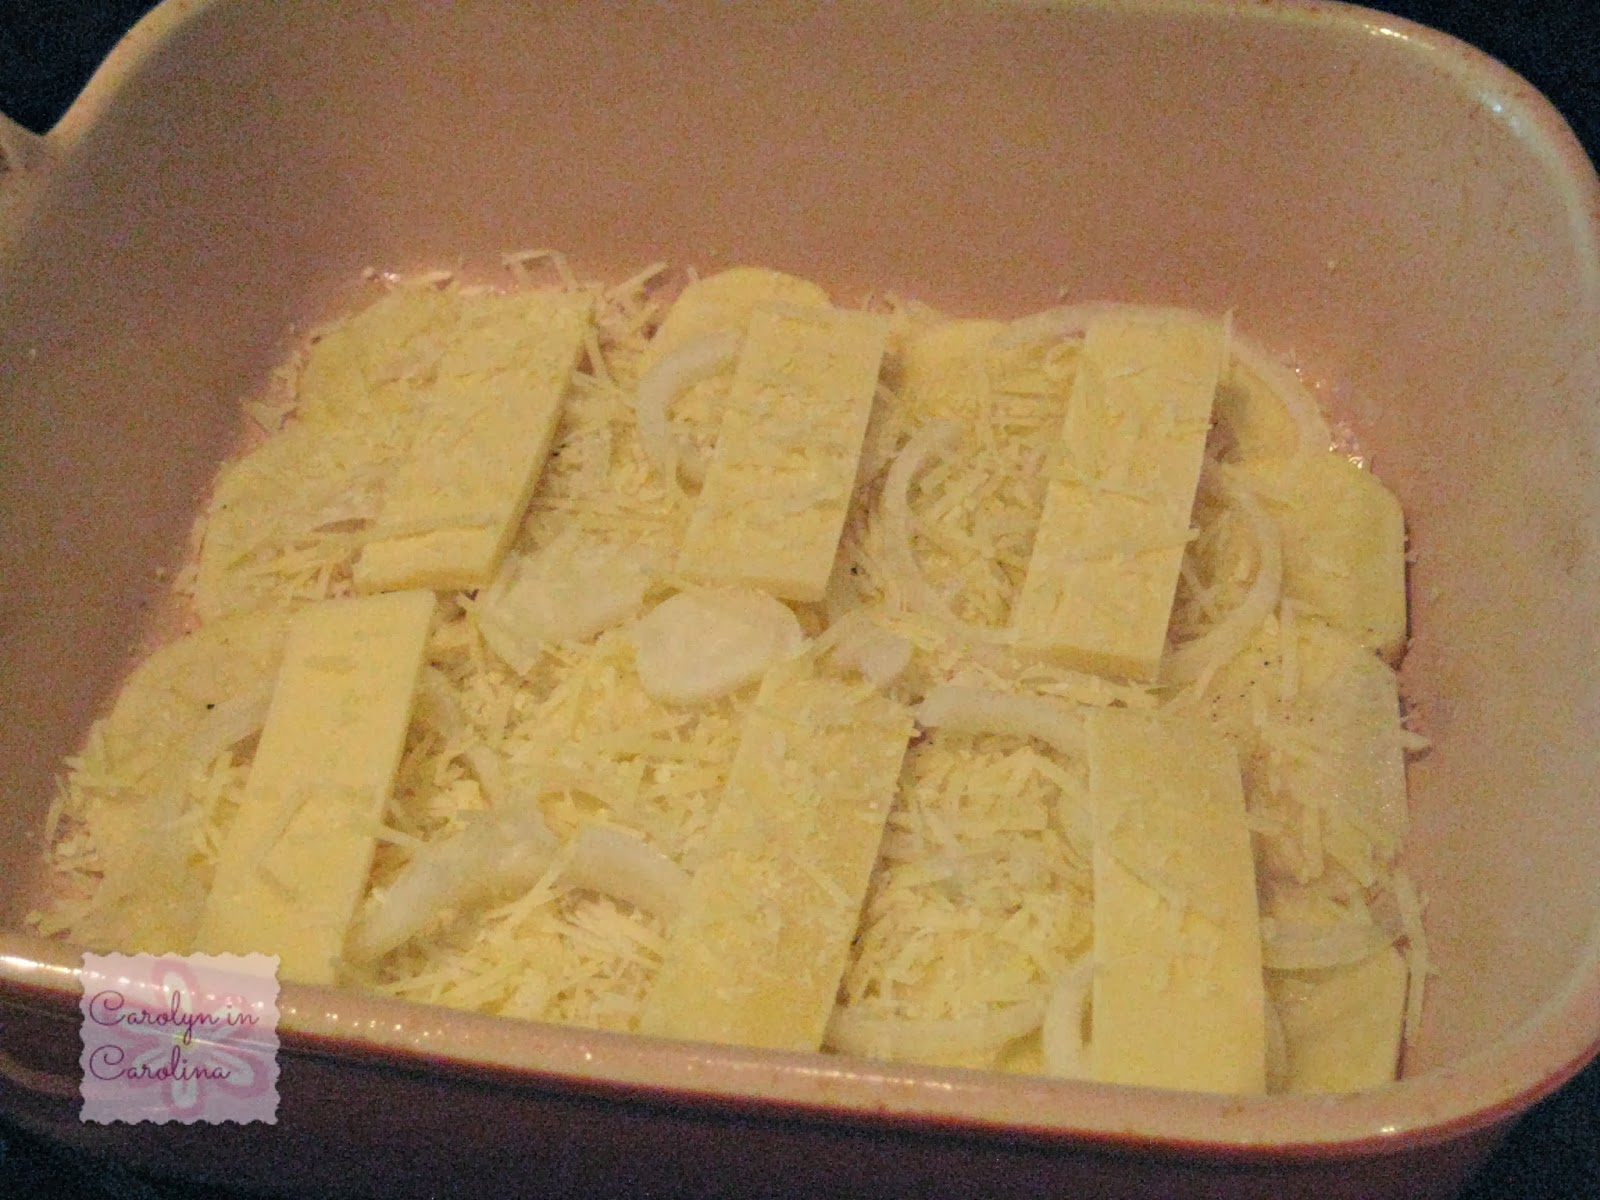 Carolyn in Carolina: Onion Potato Gratin